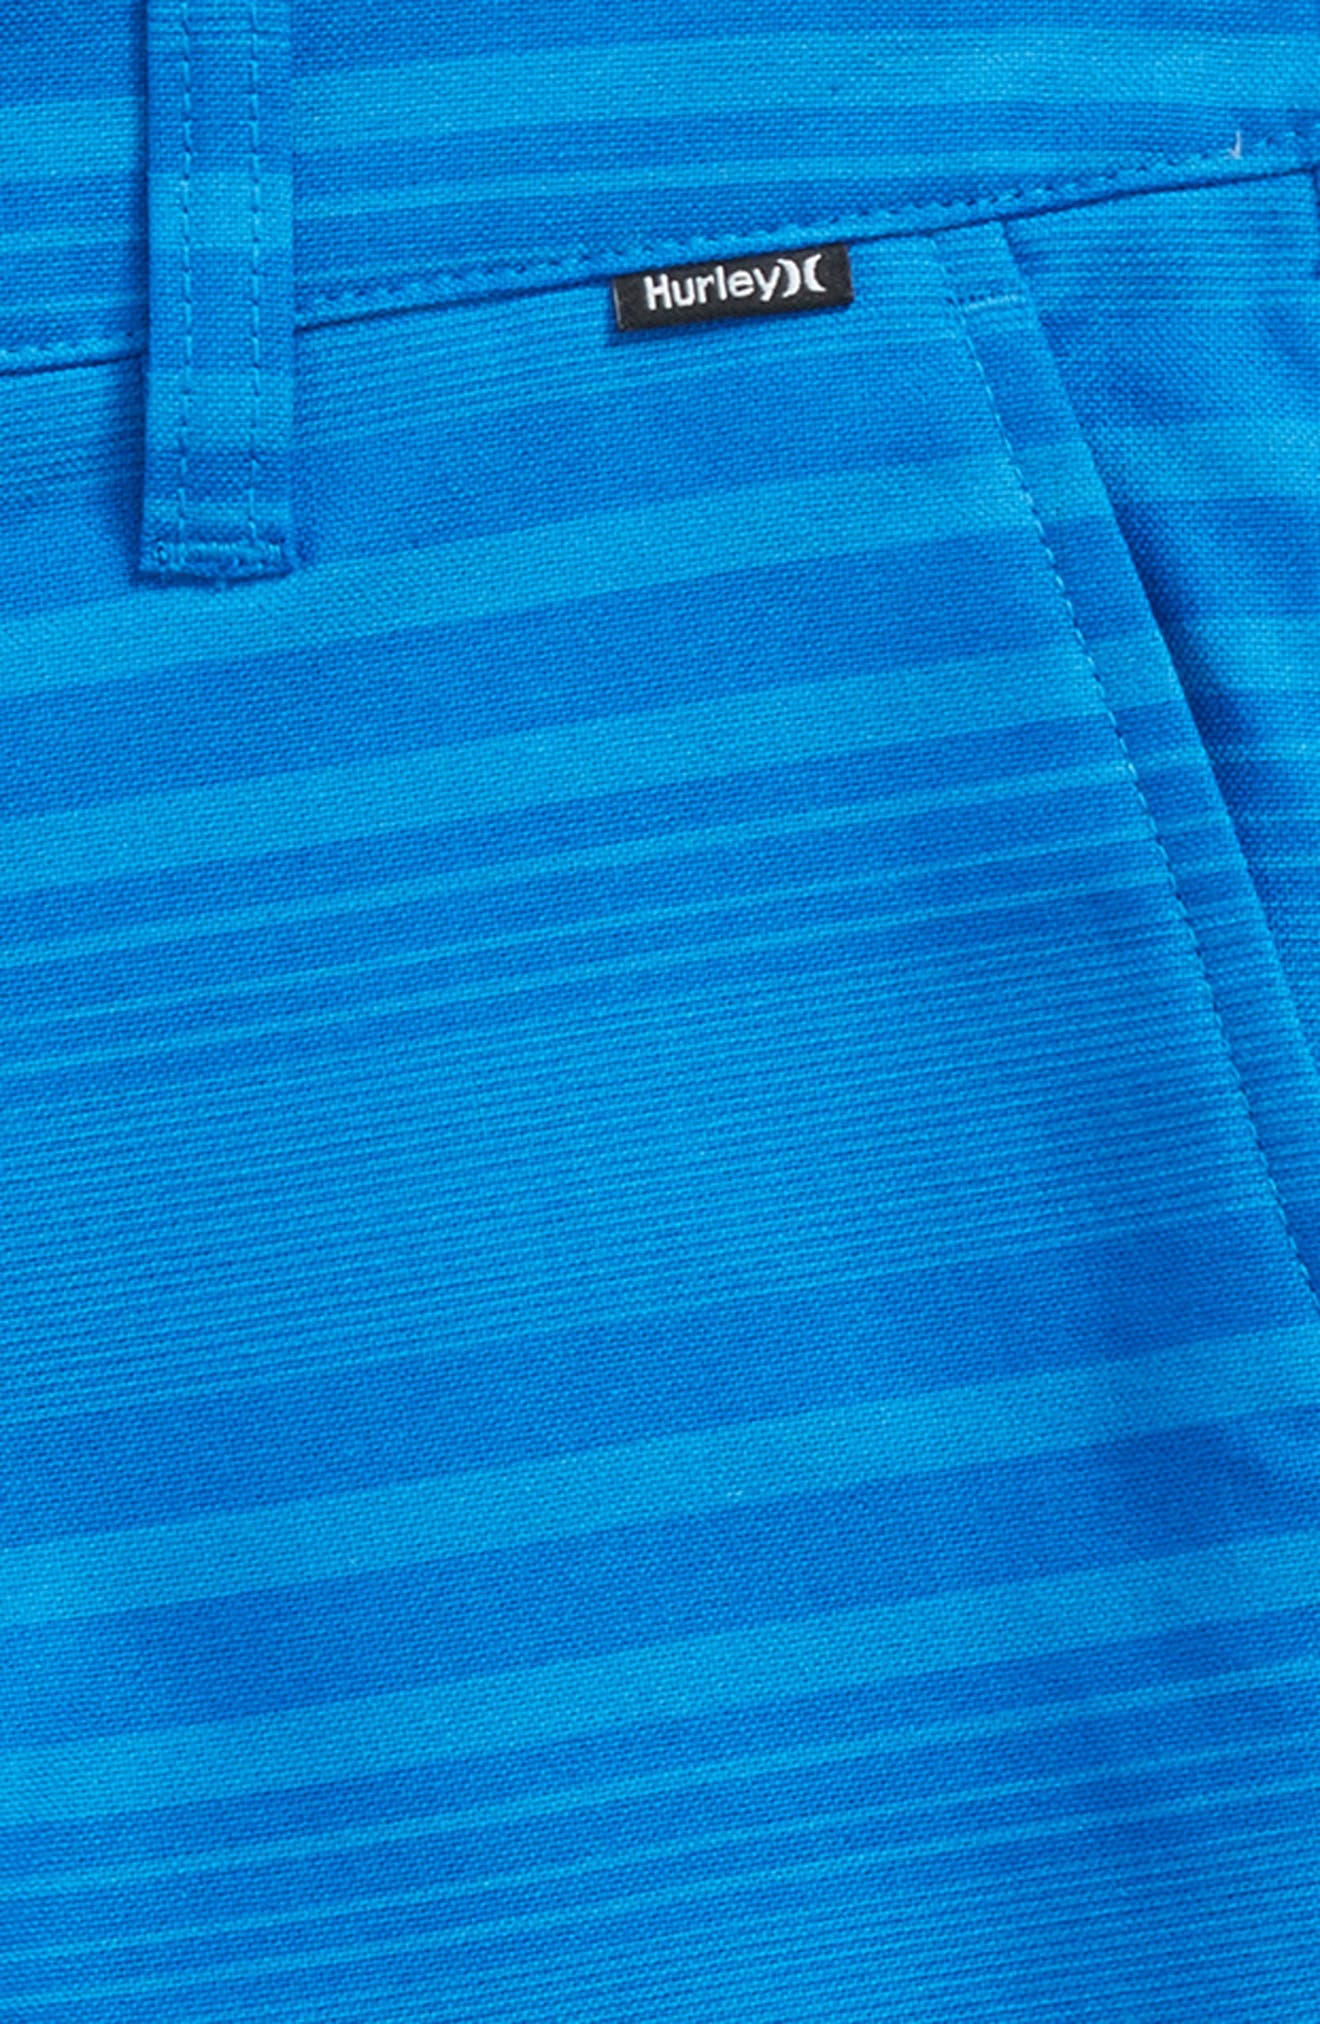 Jones Hybrid Shorts,                             Alternate thumbnail 2, color,                             400